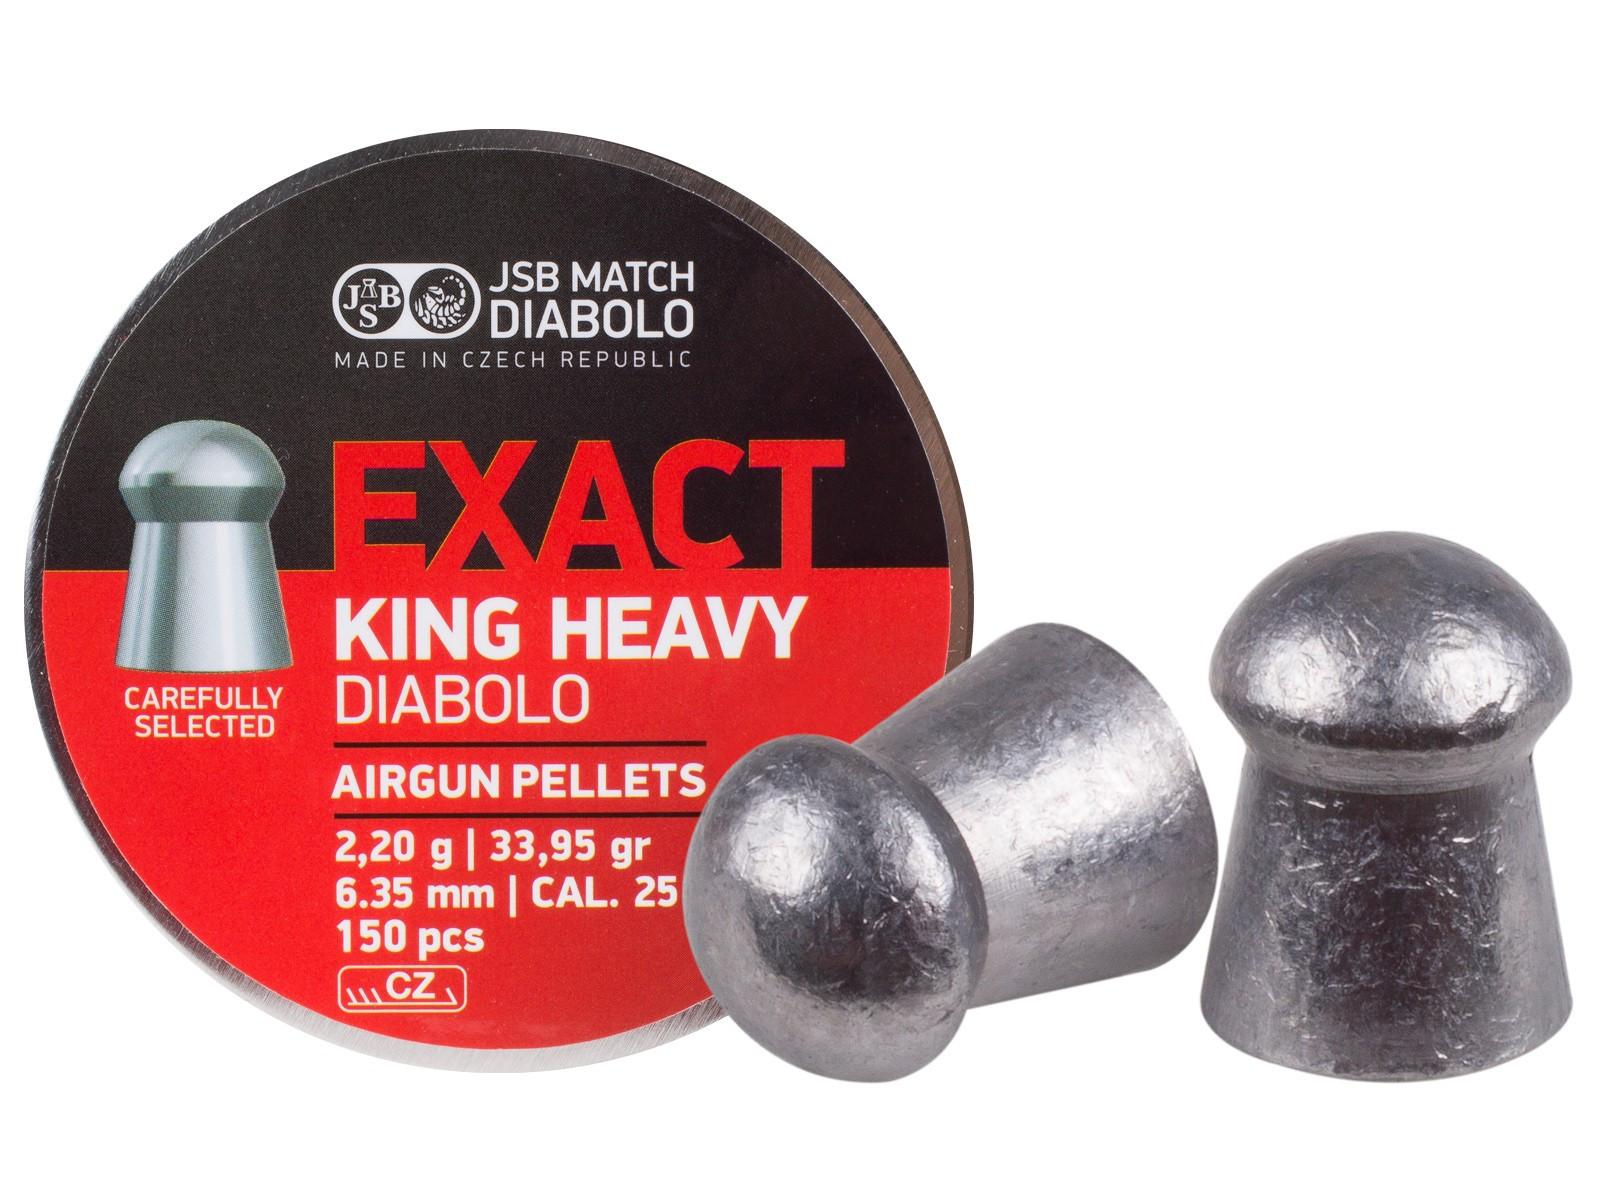 JSB Diabolo Exact King Heavy MKII .25 Cal, 33.95 gr - 150 ct